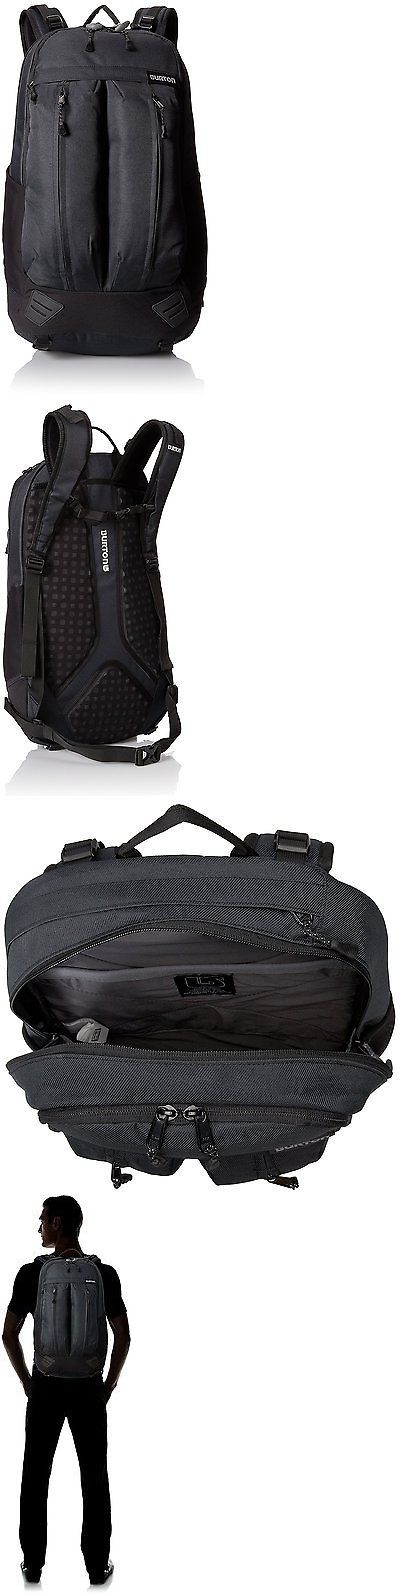 Other Skateboarding Clothing 159079: Burton Bravo Pack, True Black Heather Twill -> BUY IT NOW ONLY: $84.11 on eBay!